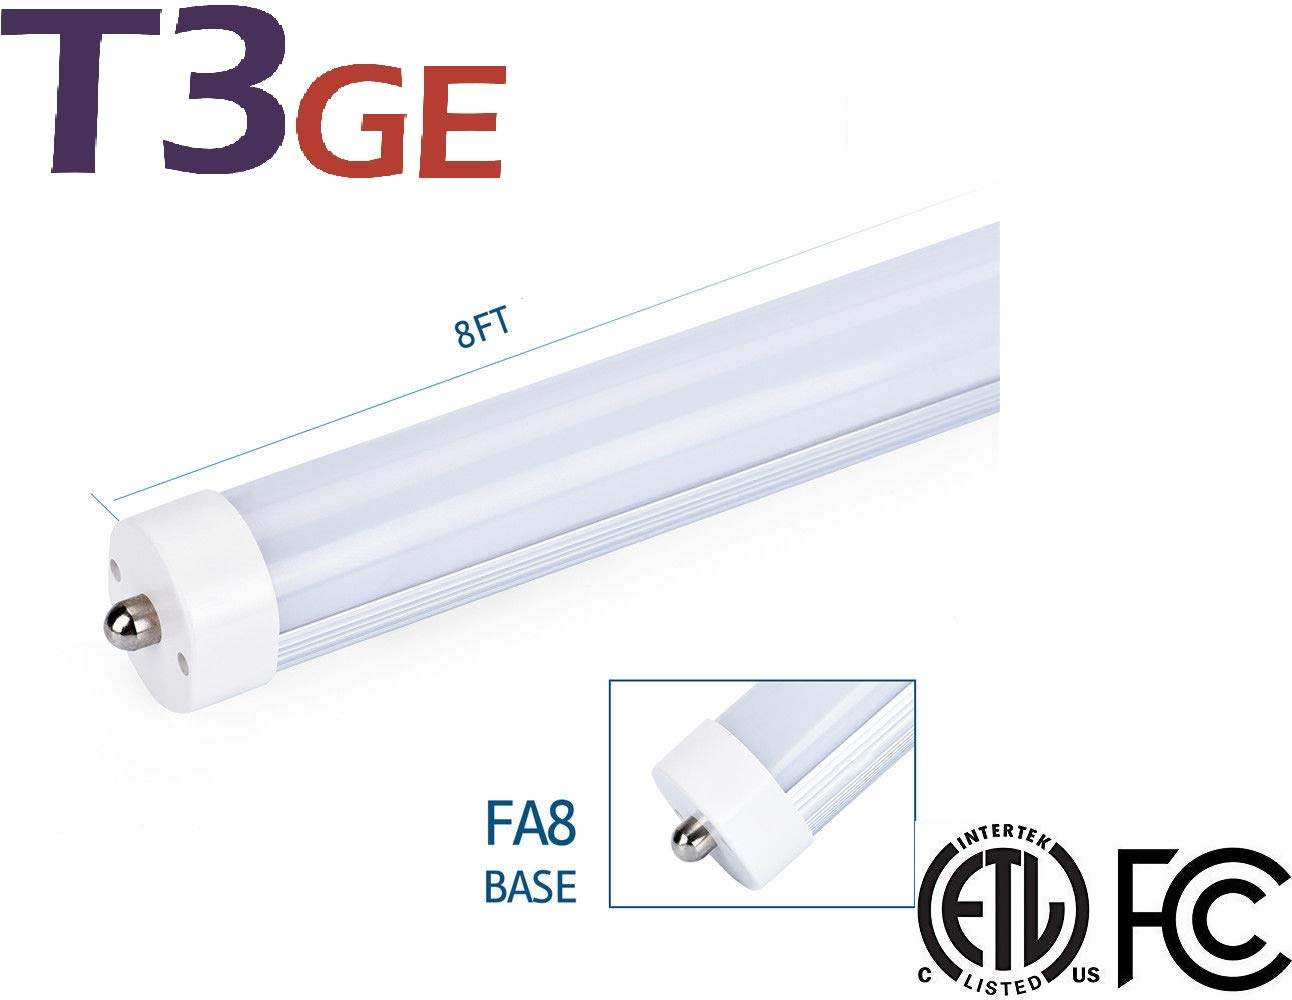 T3 グリーンエネルギー T8 LEDライトチューブ 8フィート 36W (75W-80W 相当 デュアルエンドパワー、バラストバイパス4400ルーメン、5000K、クリア、ガレージ、倉庫、ショップライト - 1パック 6 Pack B07JVBTFYK Ftf5000K -Bright White 6 Pack